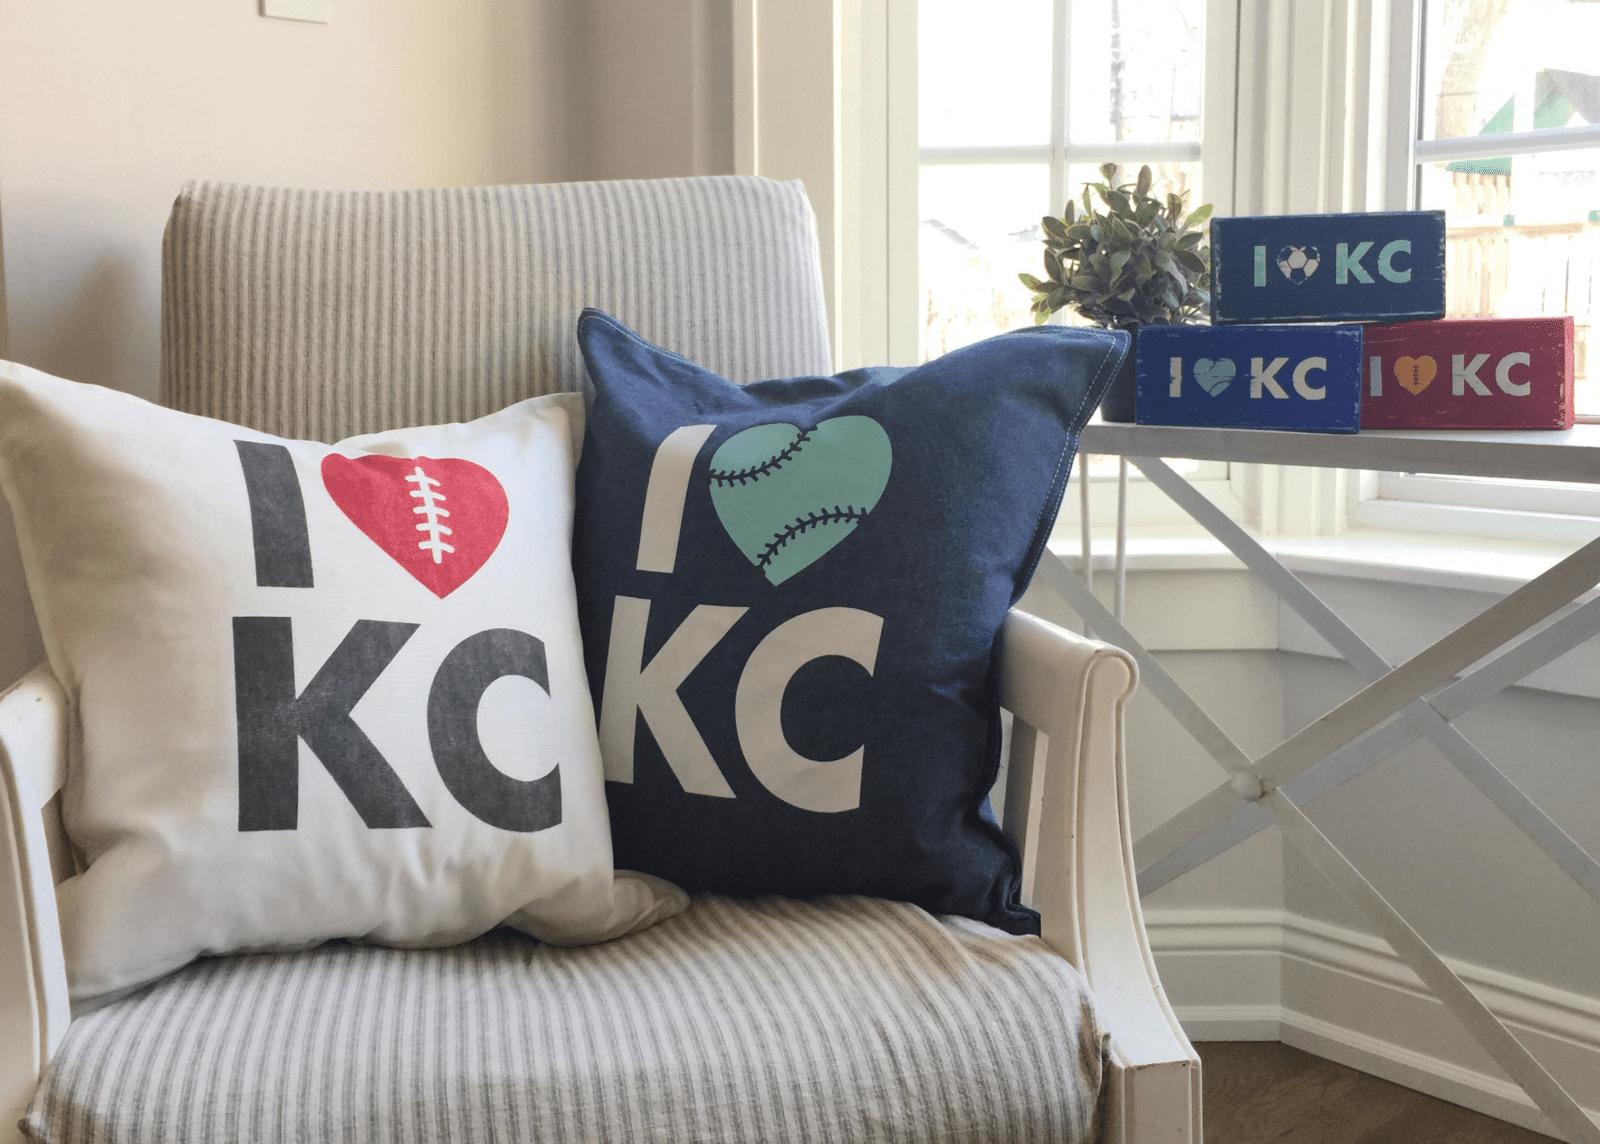 Kansas City souvenirs